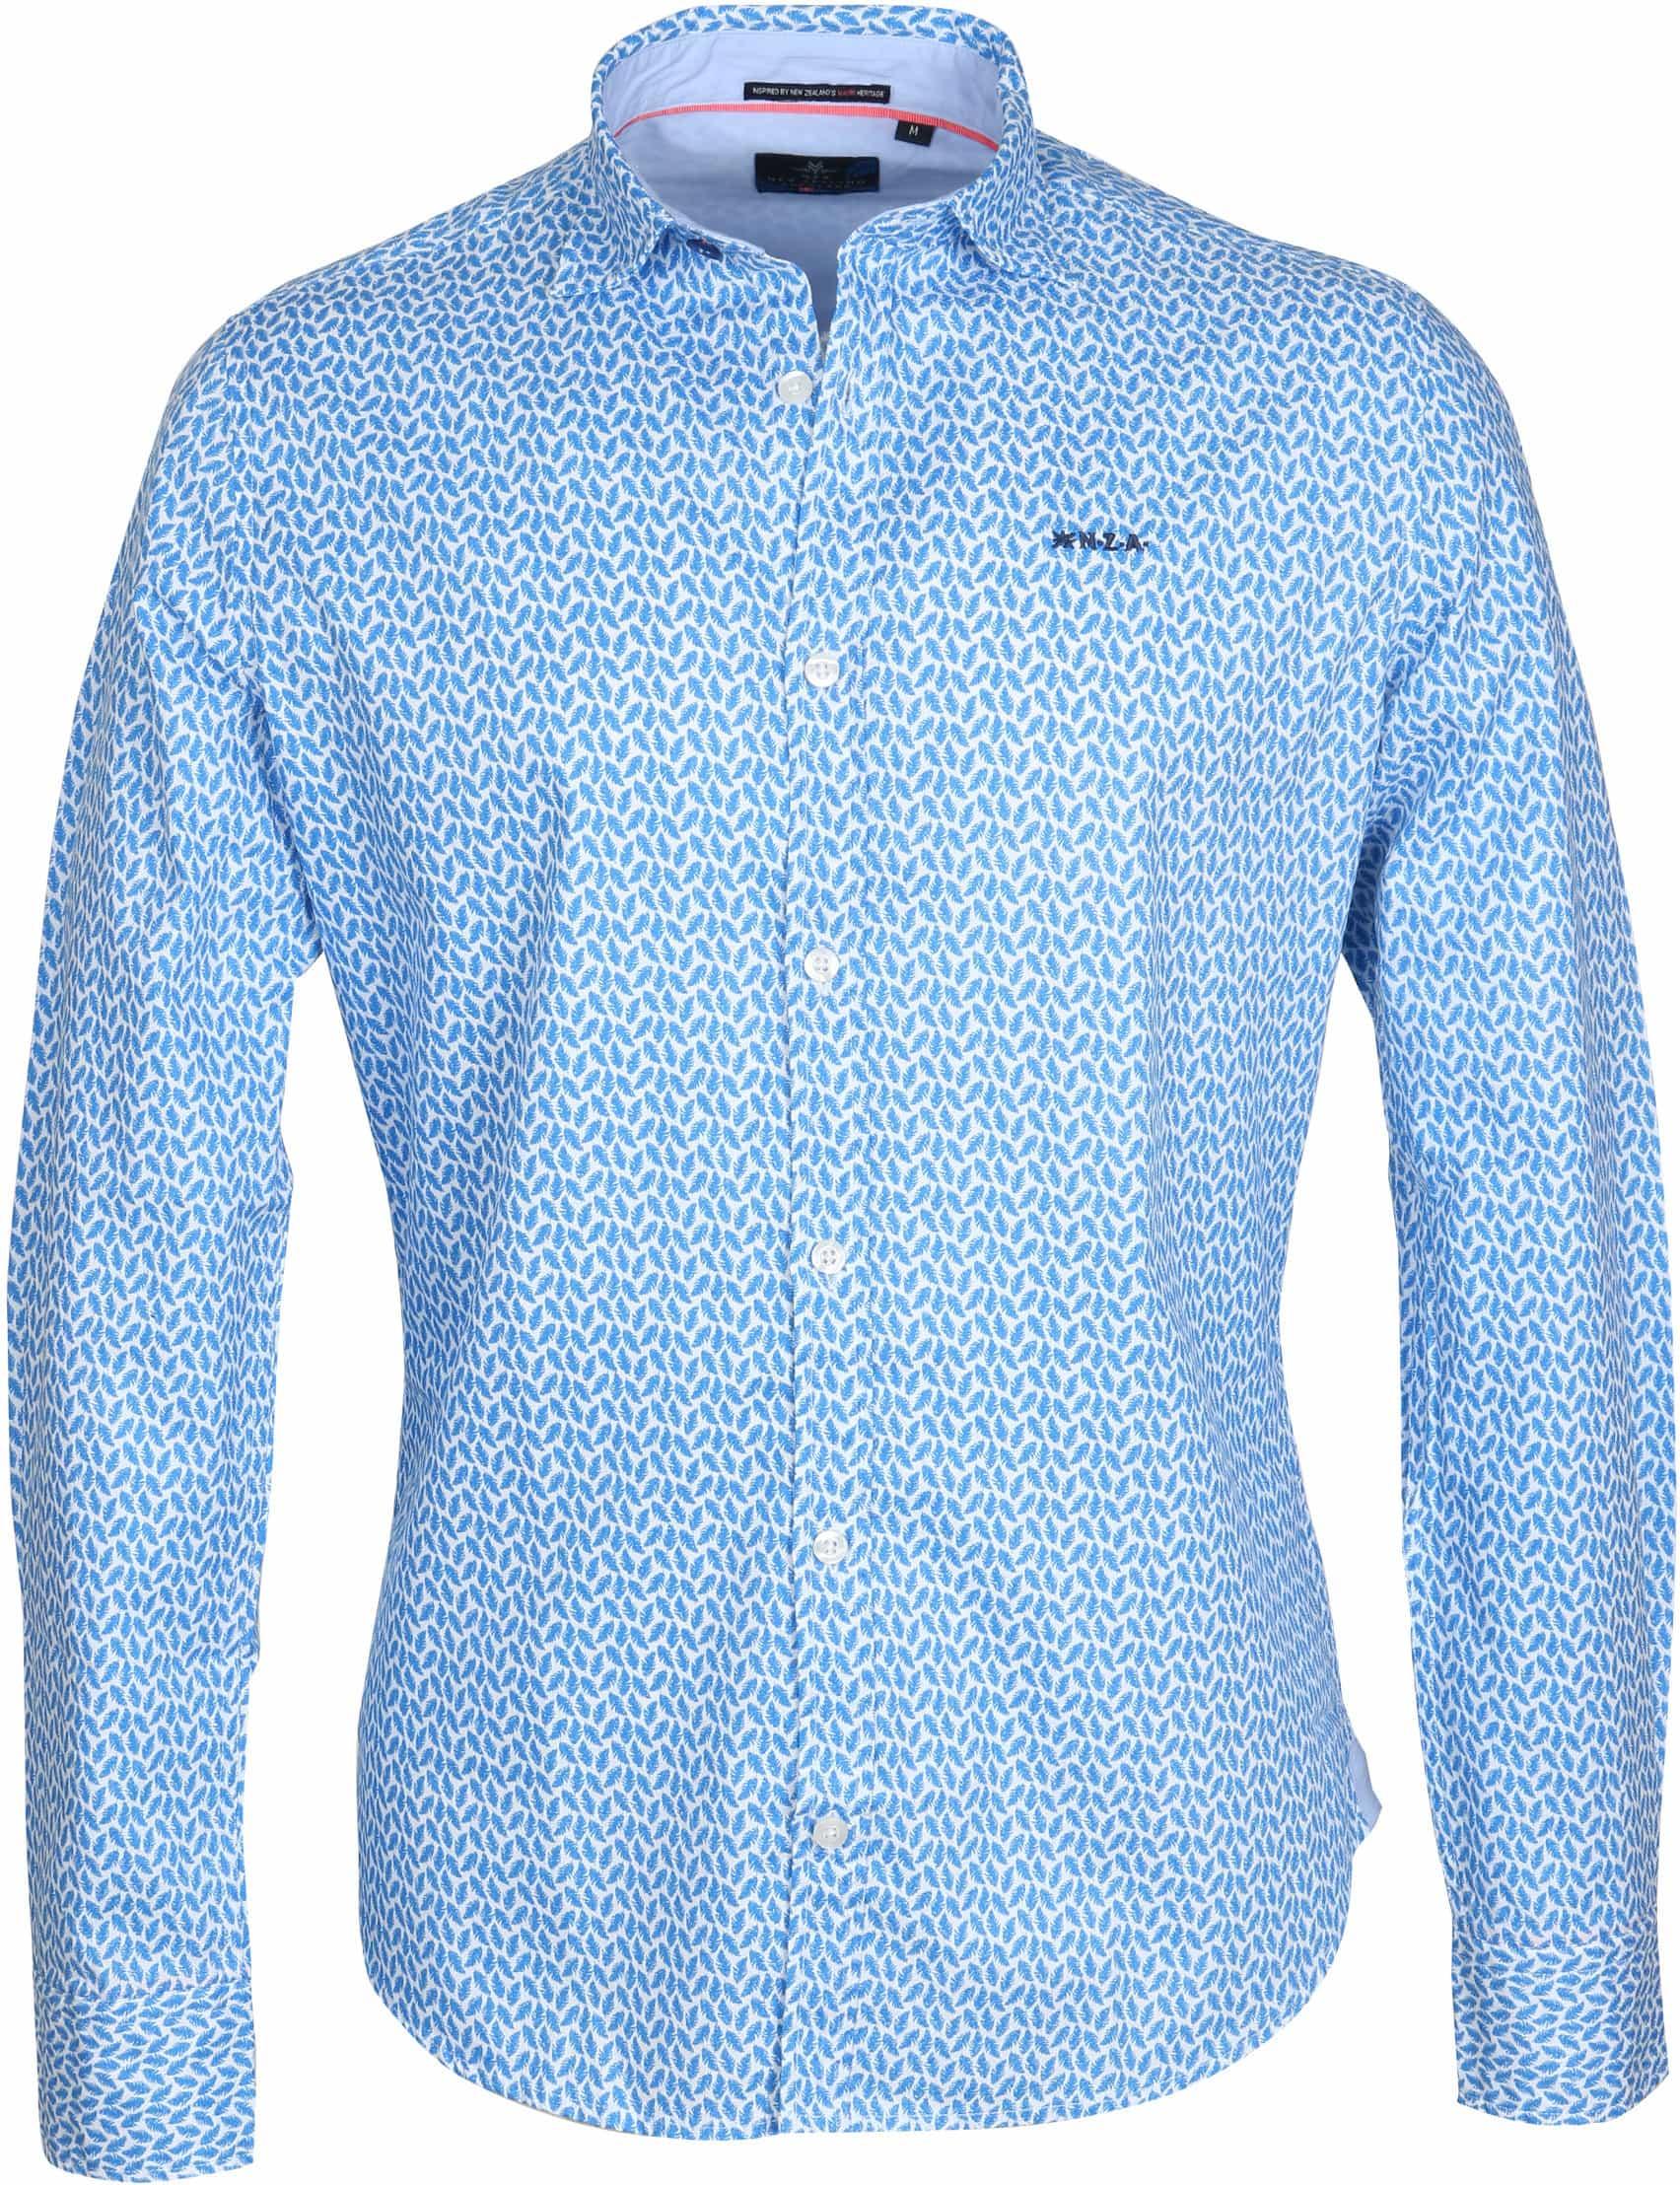 NZA Overhemd Jasper Blauw Print foto 0